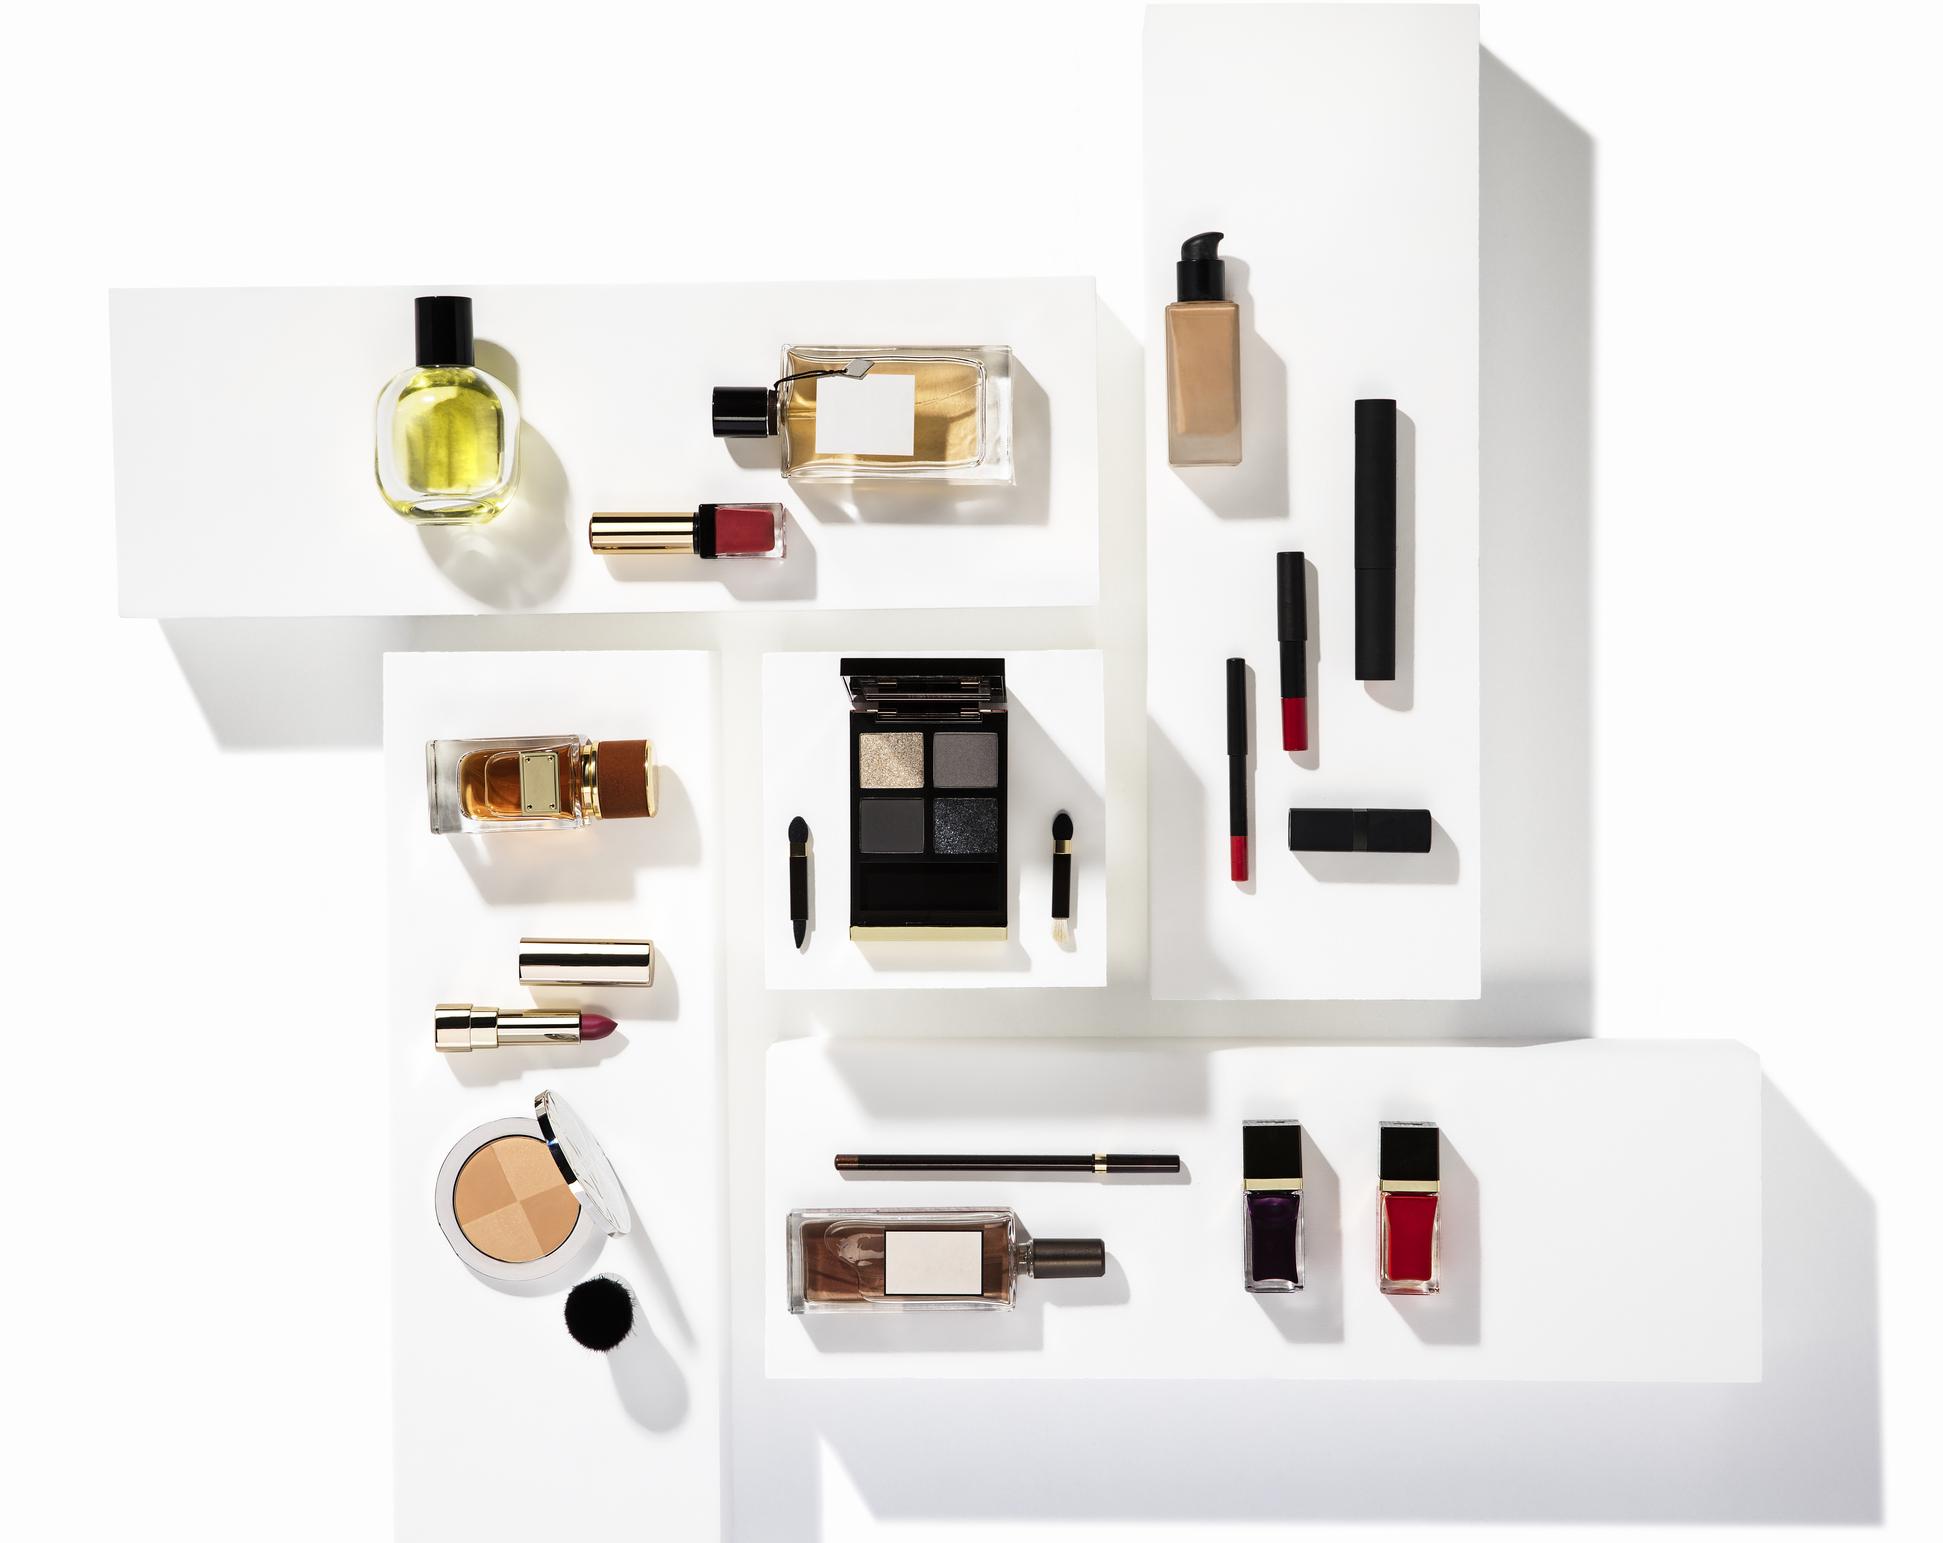 Parfüms aus dem Internet